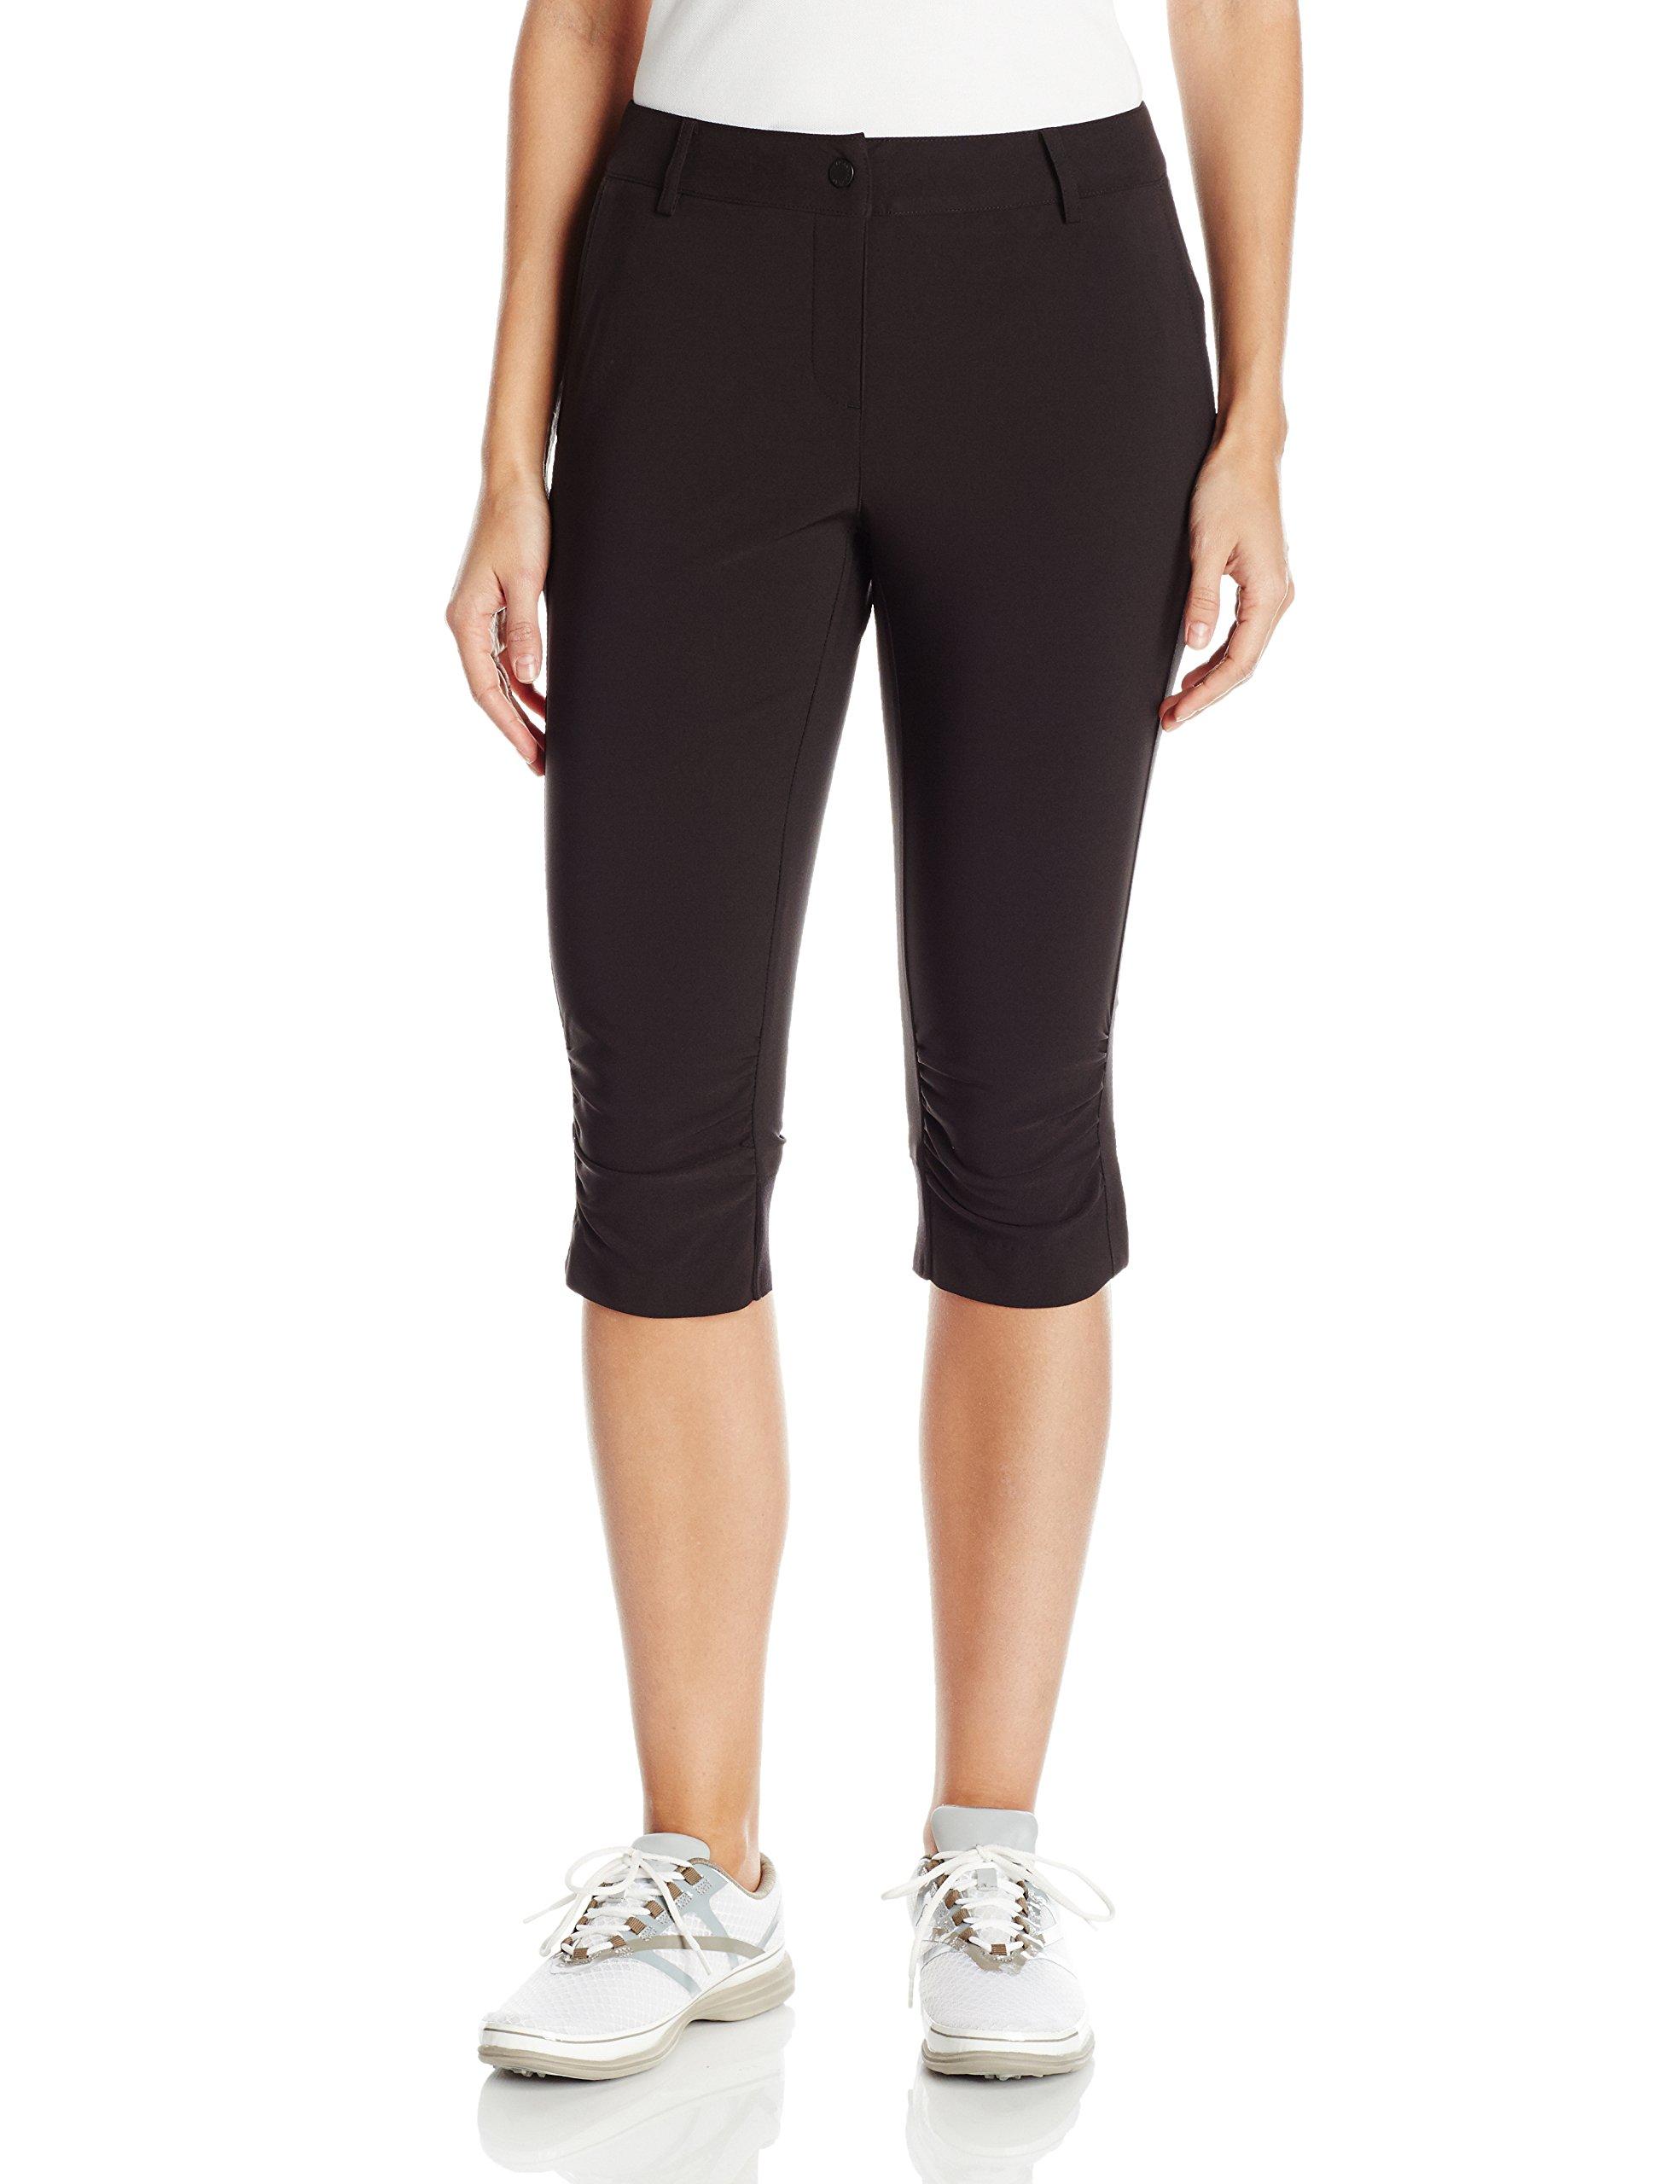 Cutter & Buck Annika Women's Moisture Wicking, UPF 50+, Stretch Morgain Long Short, Black, 2